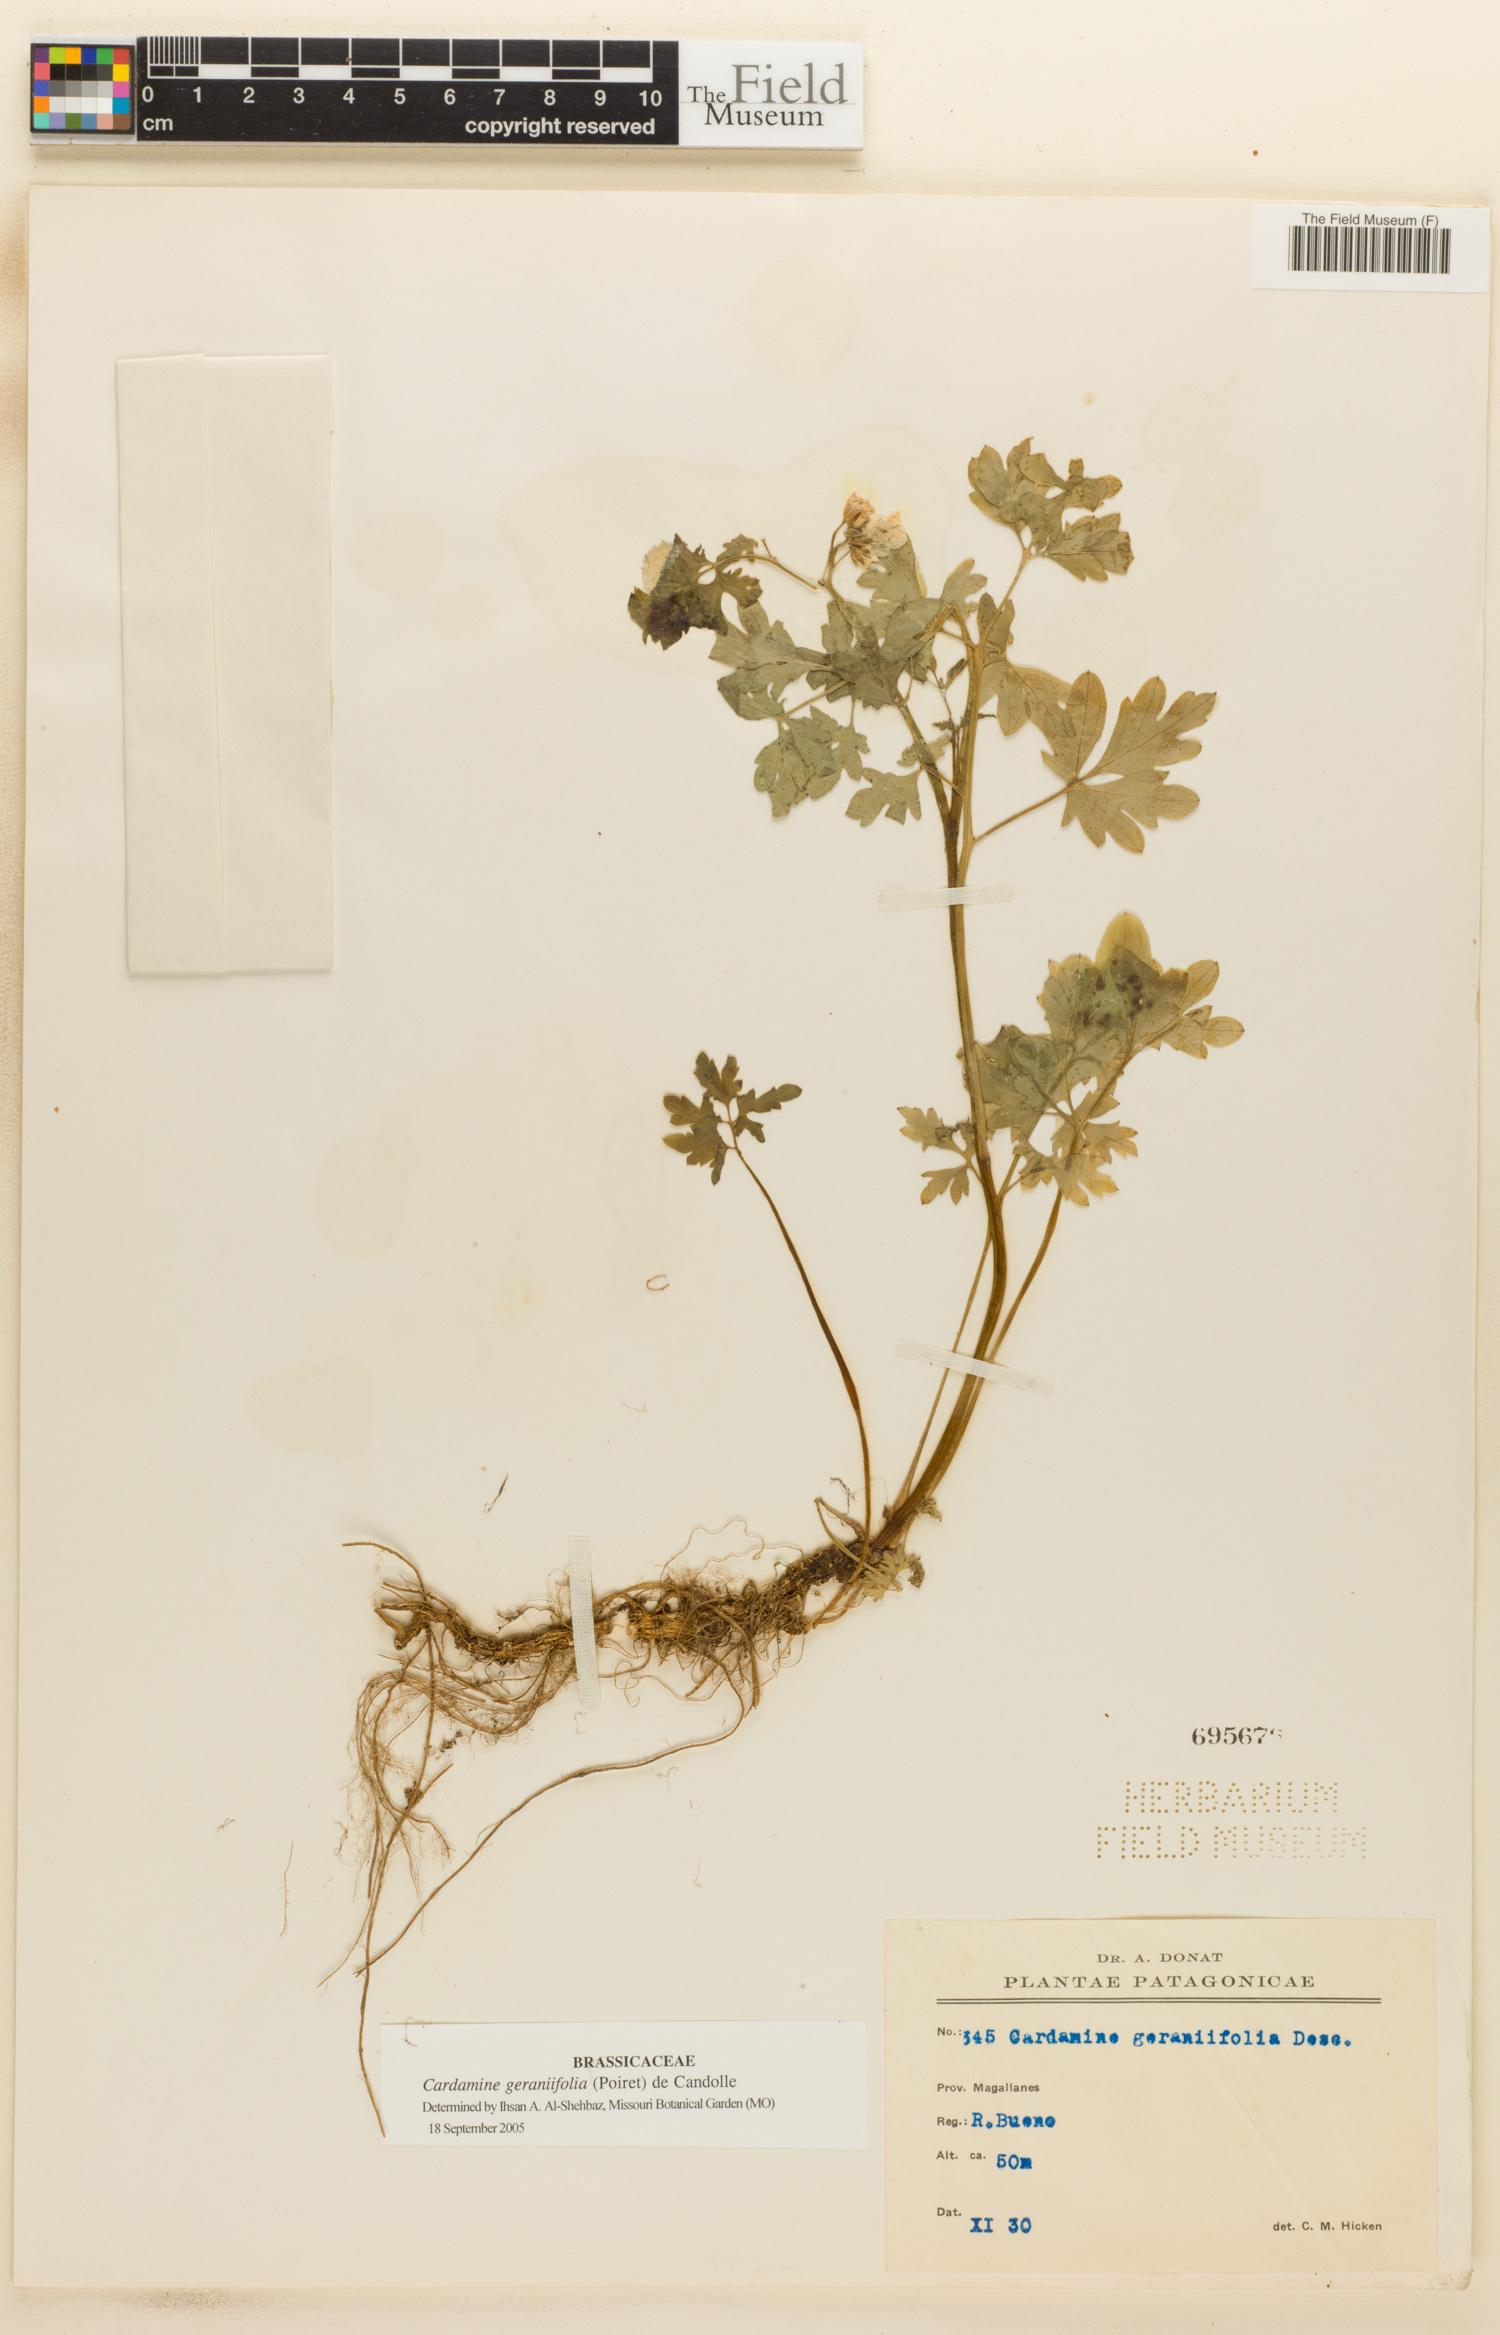 Cardamine geraniifolia image